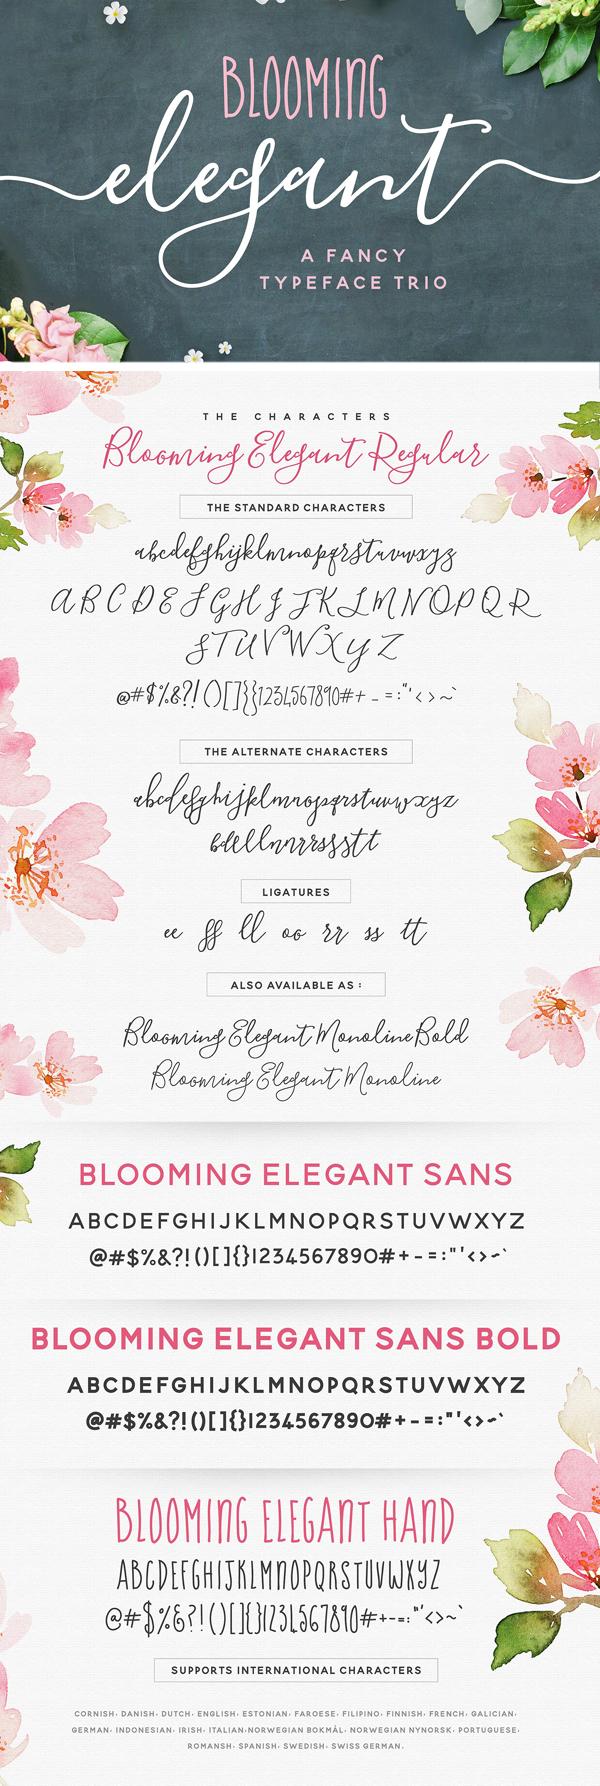 Blooming Elegant Font Trio